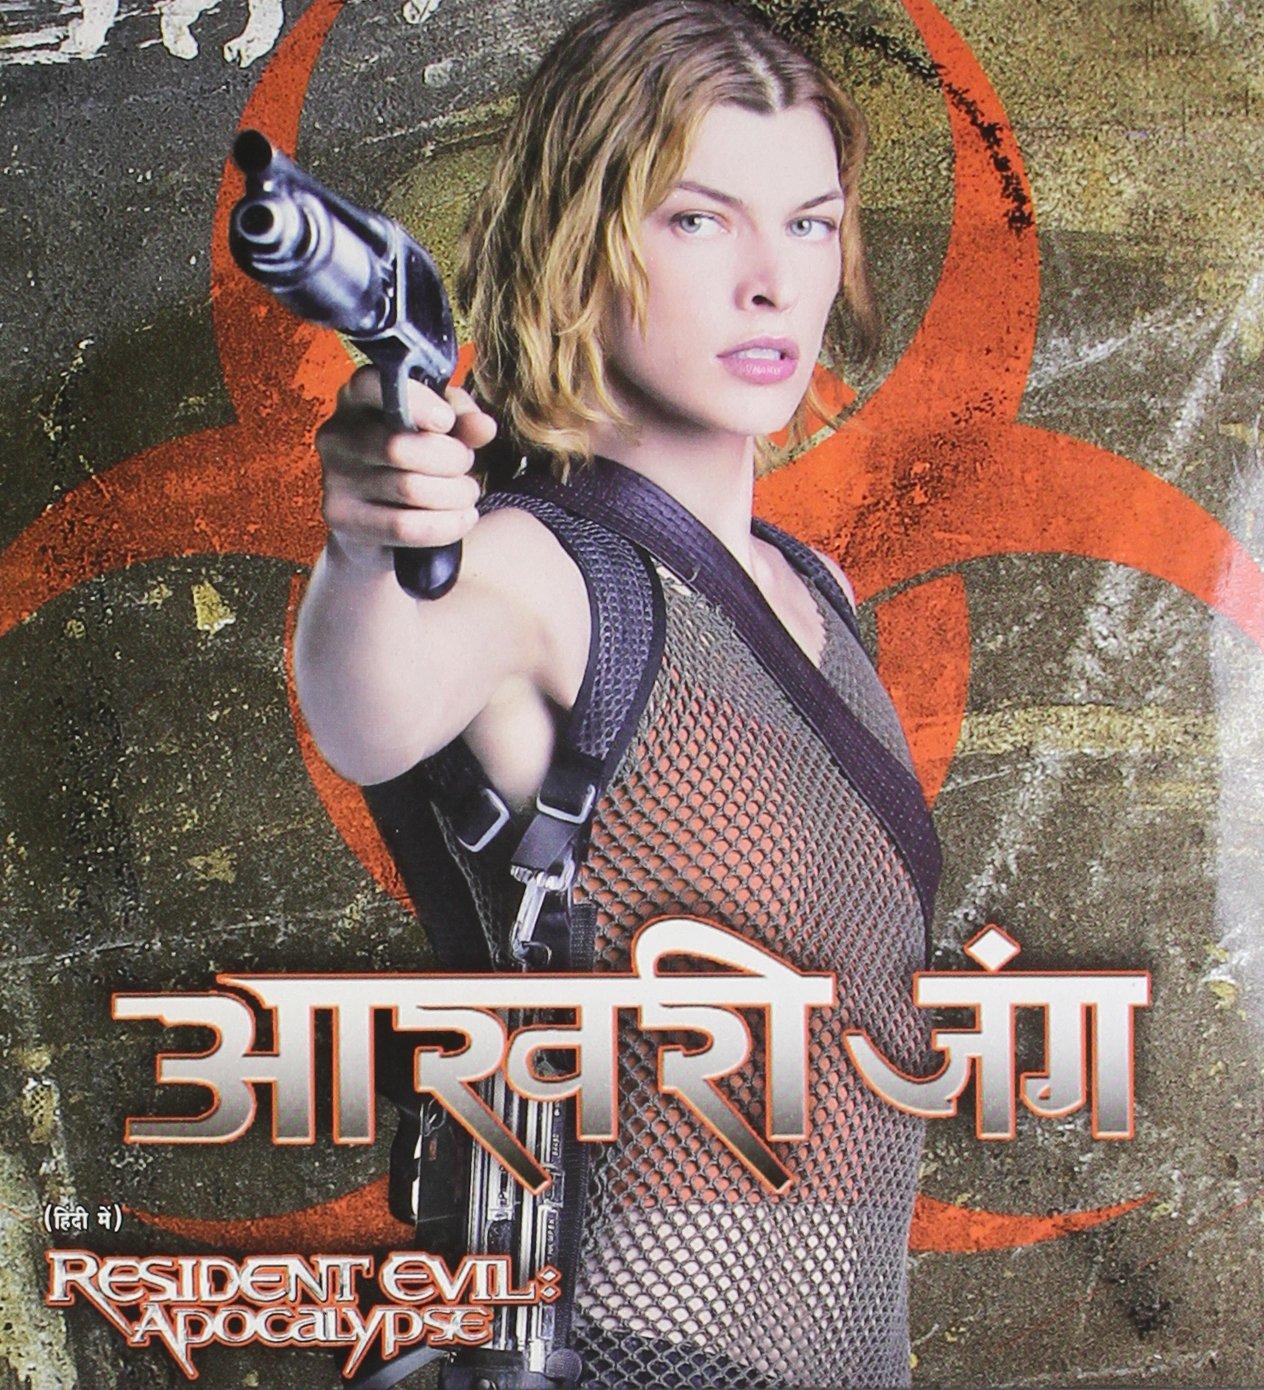 Resident Evil Apocalypse Aarwari Jung Amazon In Movies Tv Shows